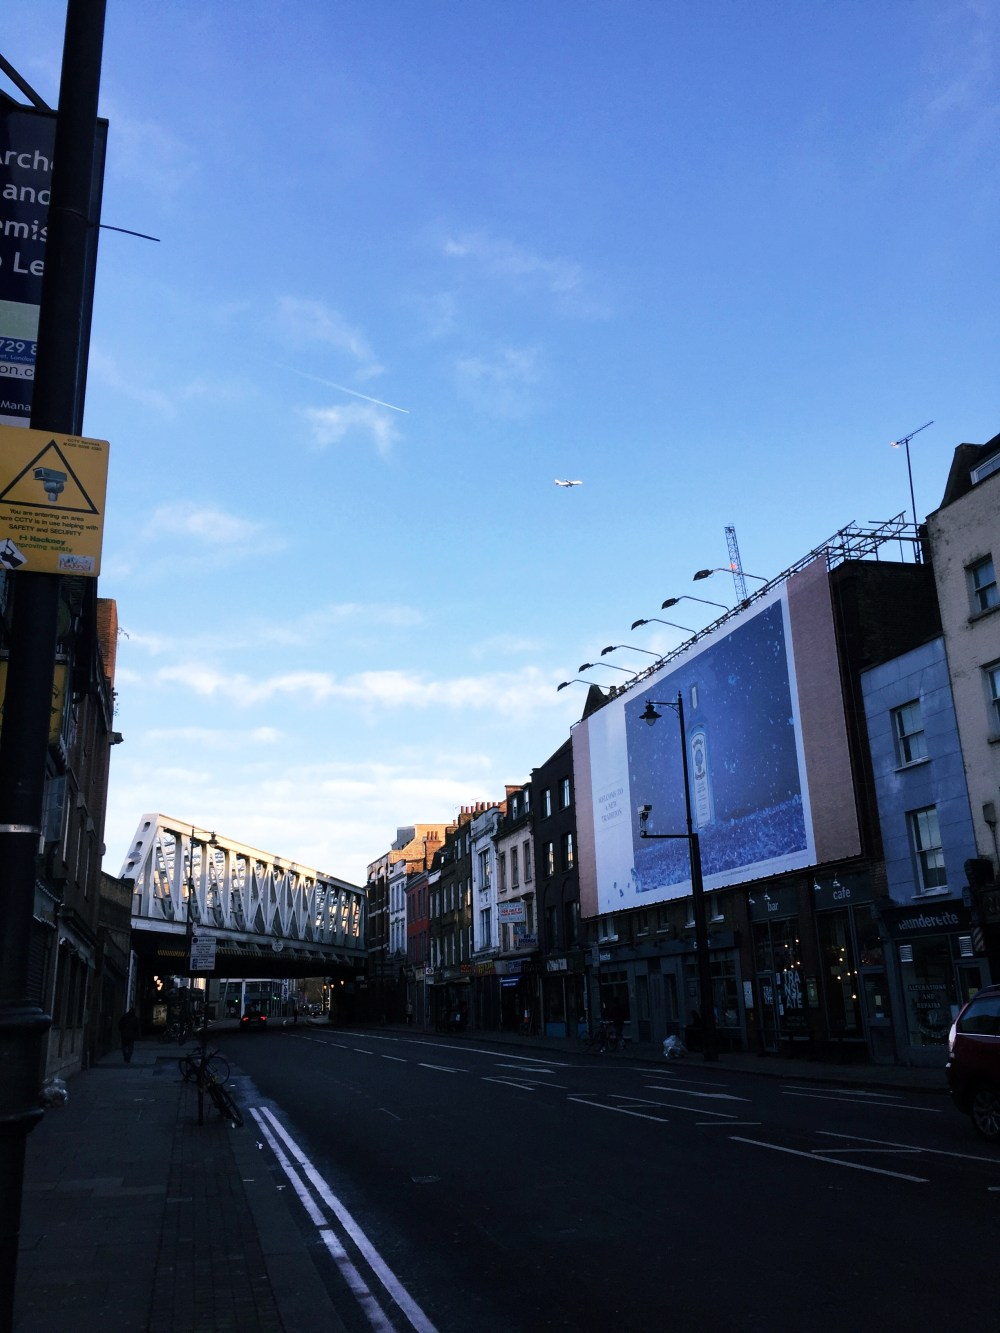 11 Dec 2016: Old Street x Kingsland Road | London, England